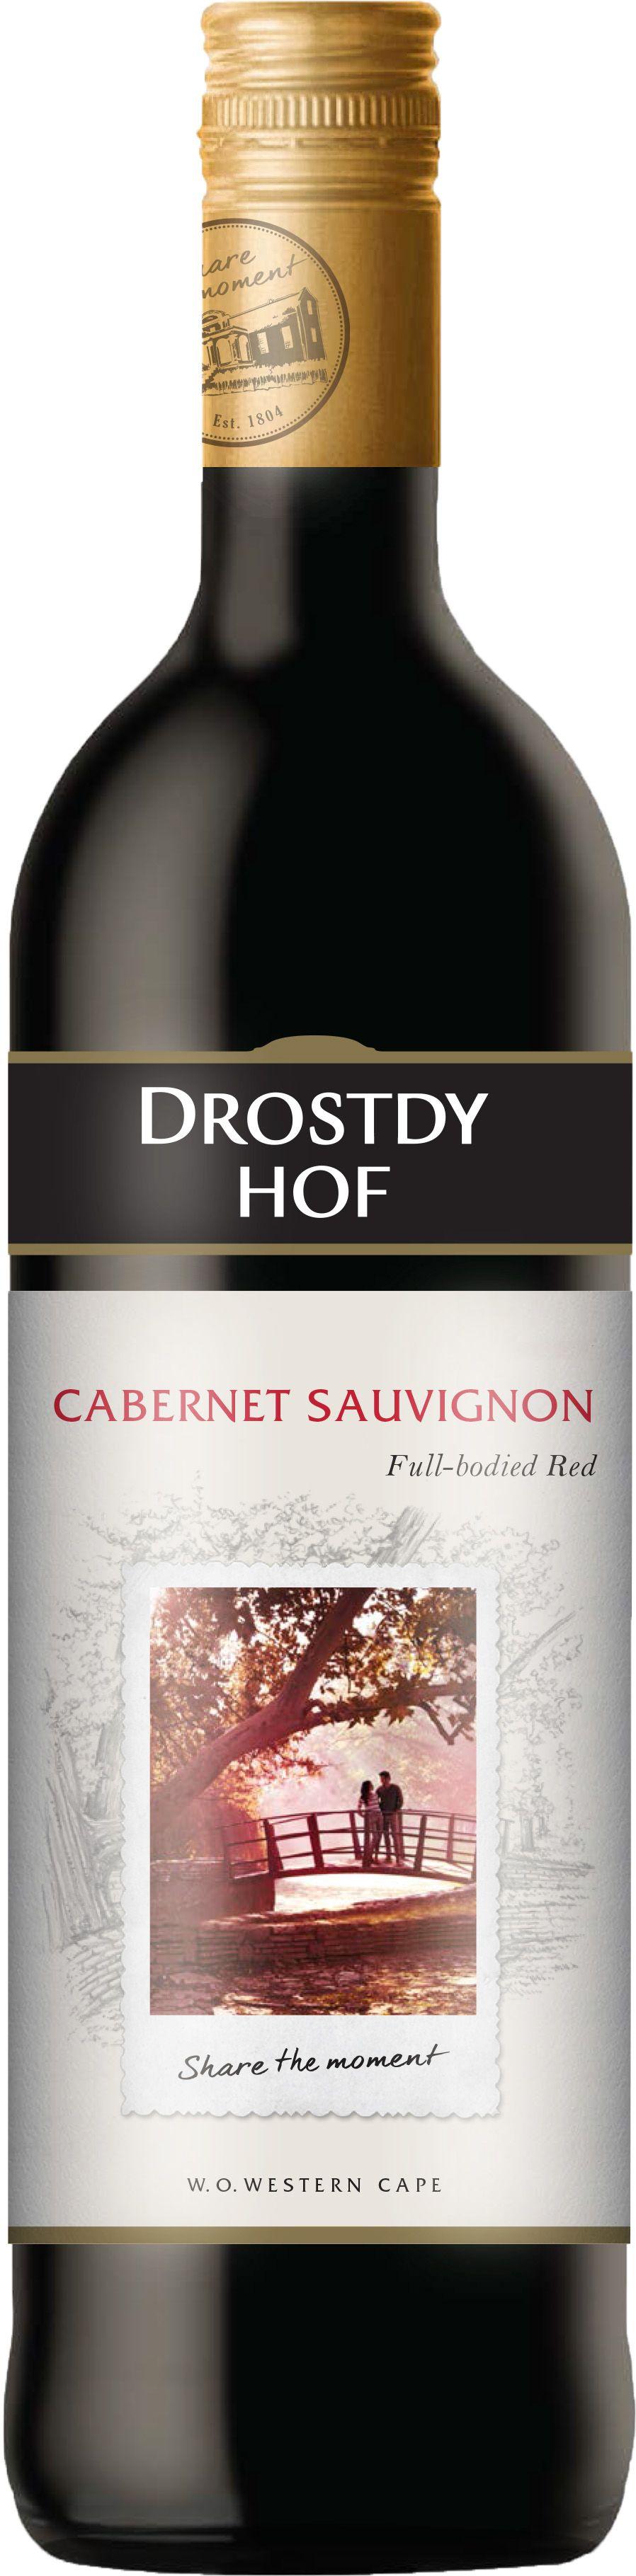 Drostdy-Hof Cabernet Sauvignon